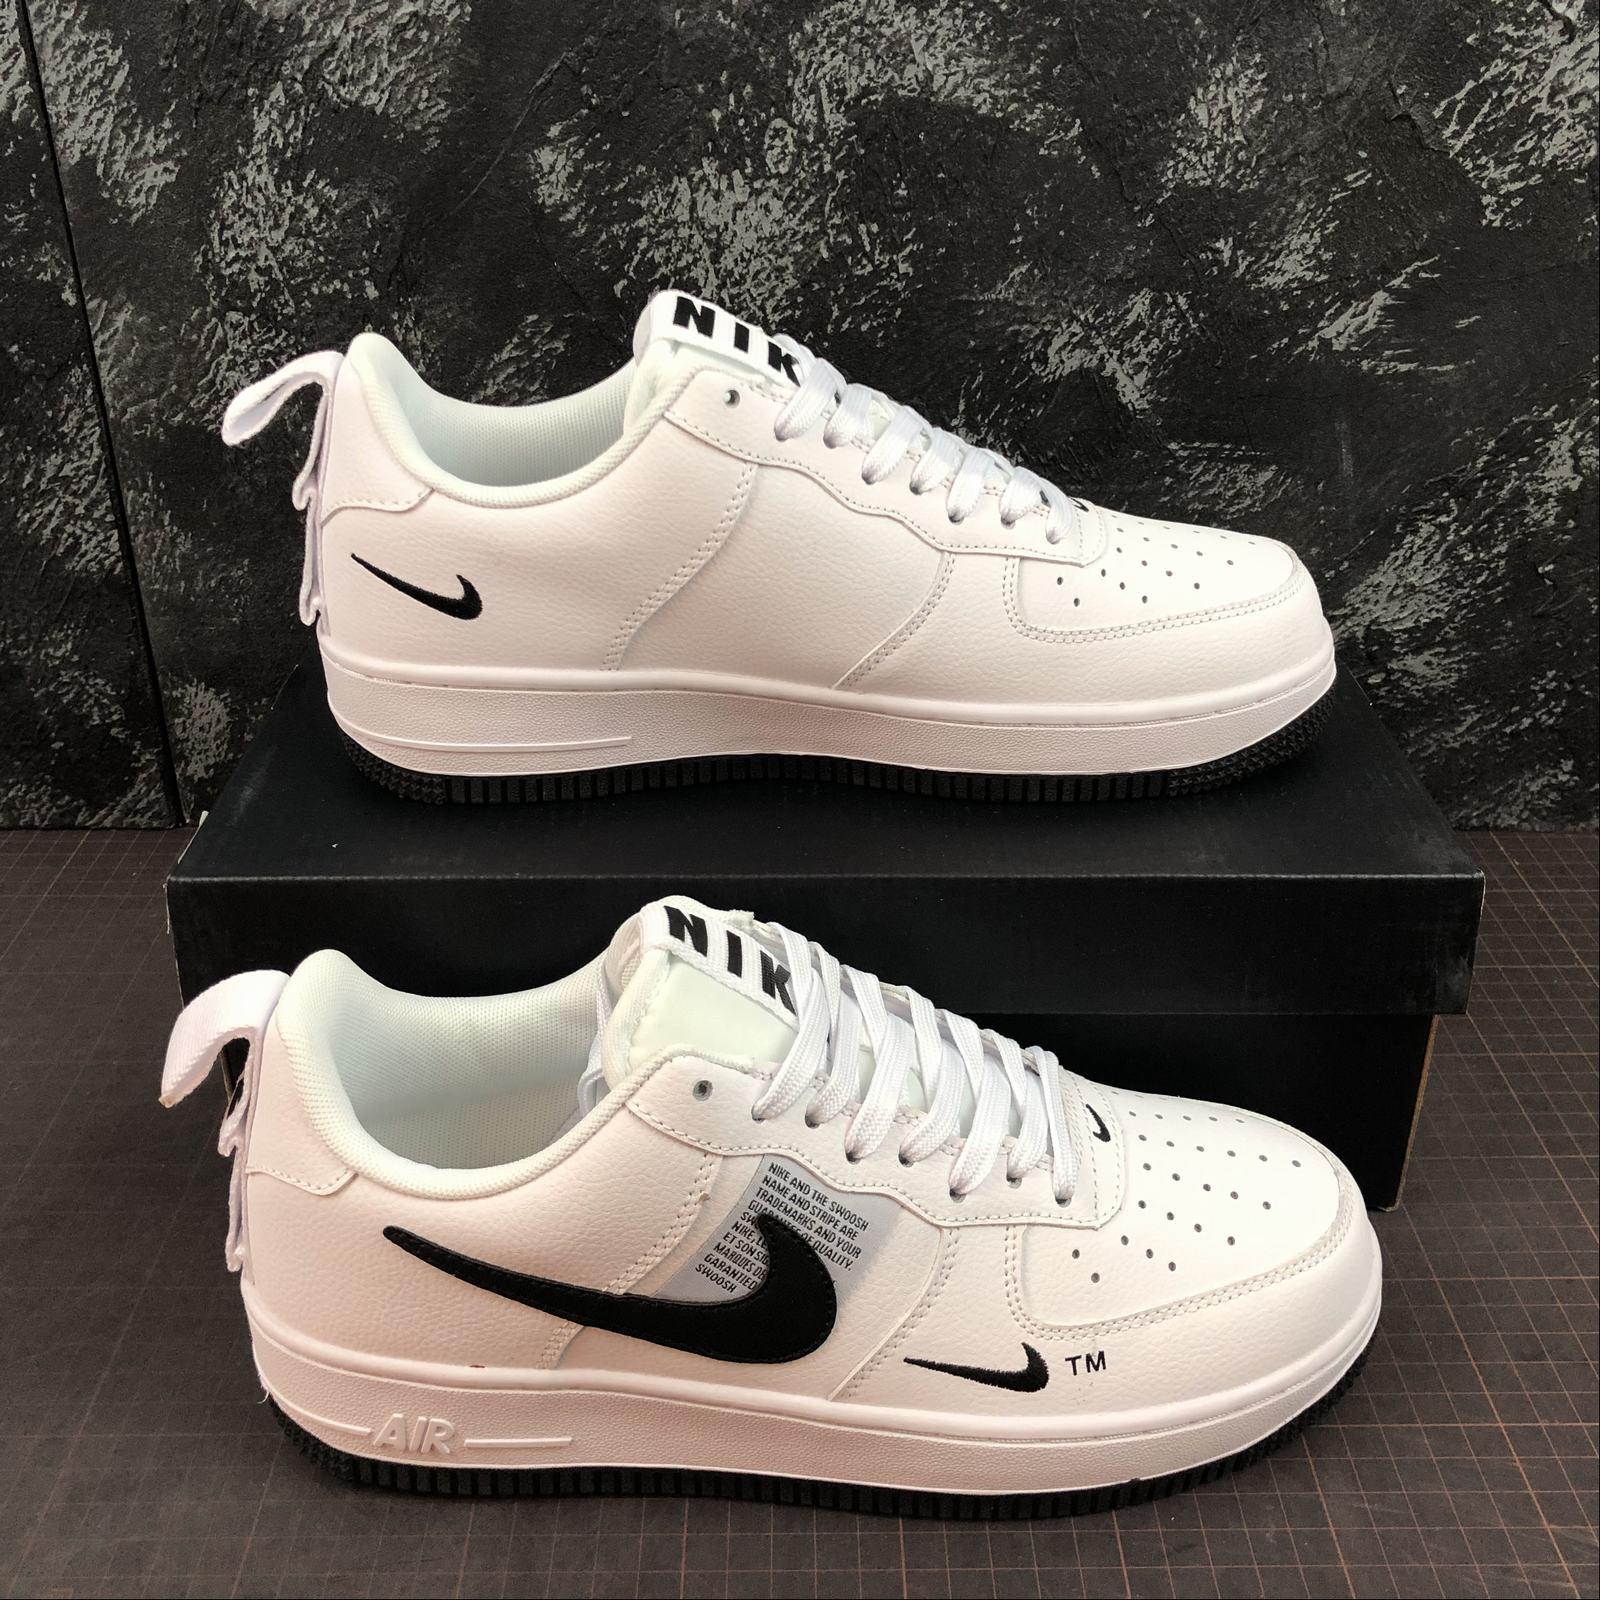 giay-sneaker-nike-air-force-1-07-cq4611-100-da-white-black-white